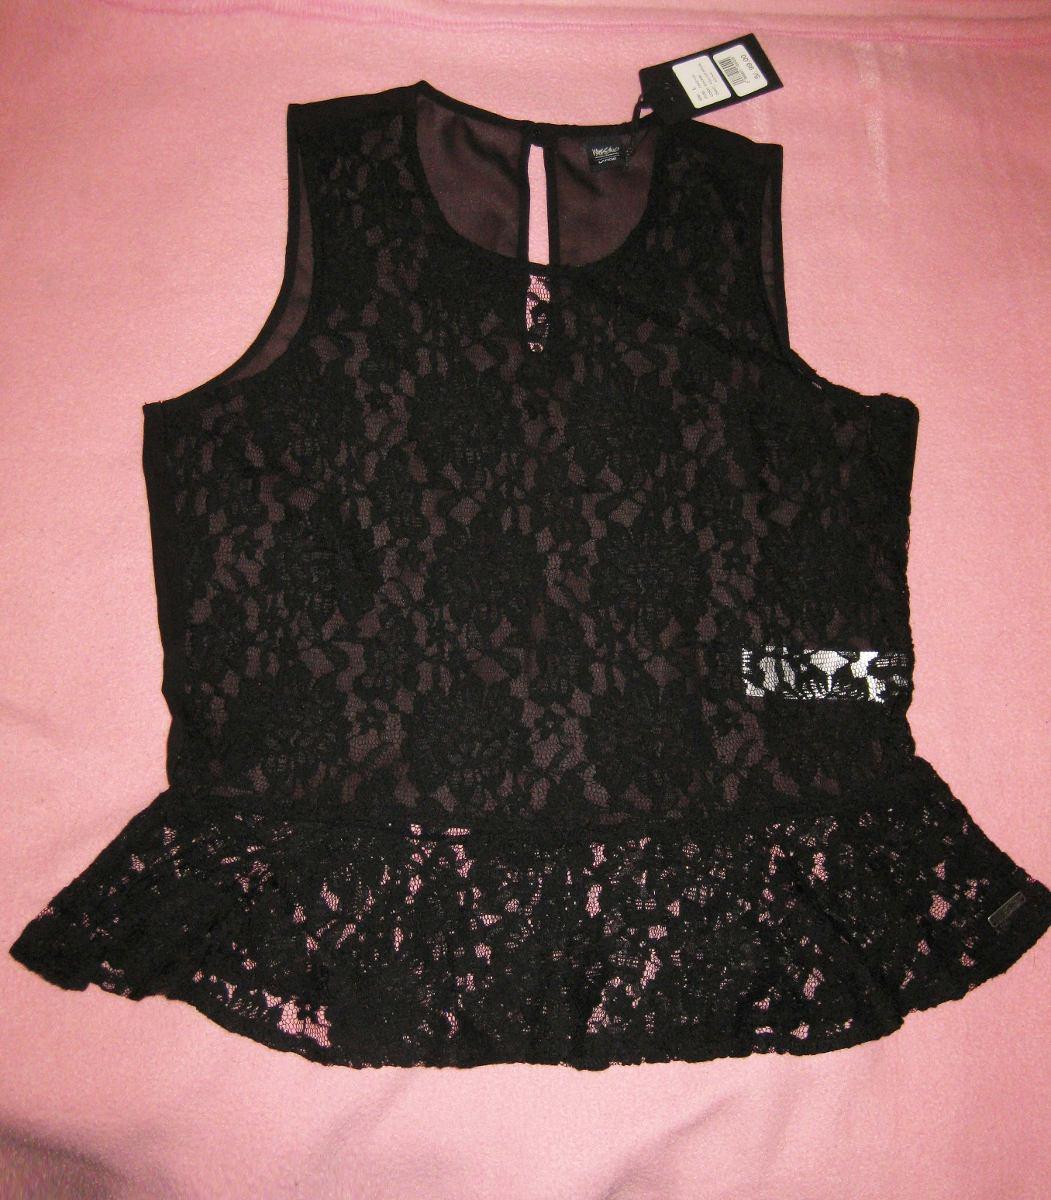 $ - Mujer Ajuste de encaje - Encaje Blusa, Escote Chino Retazos Blanco y Negro / Otoño ¿Shopping for Blusas para Mujer cheap online? Buy at bloggeri.tk on sale today!